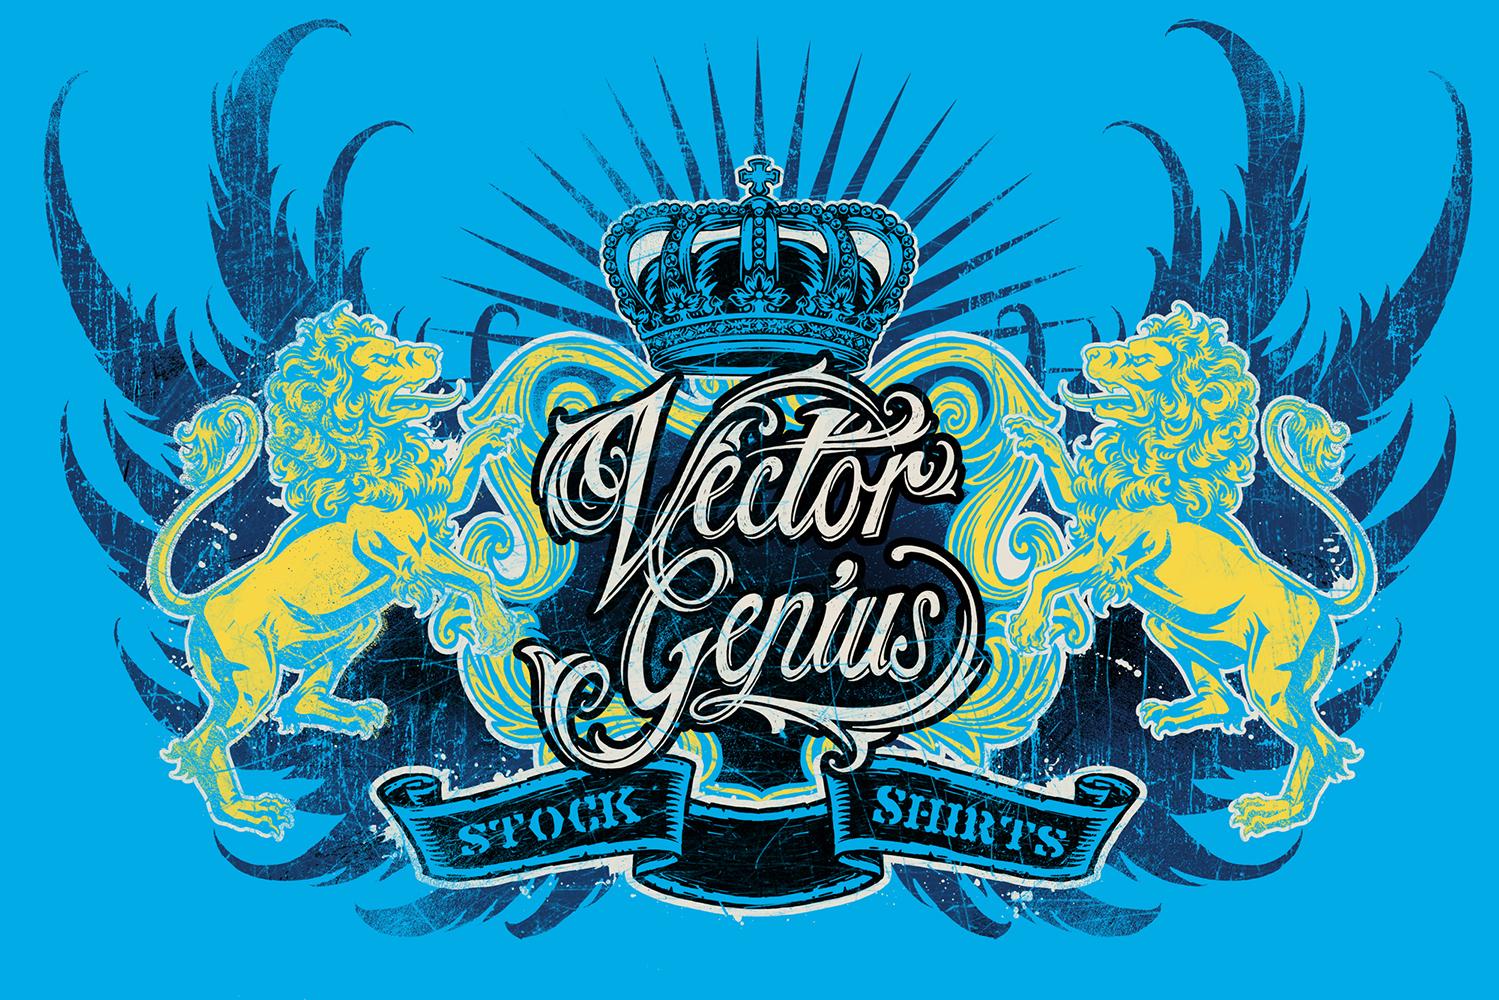 1499x1000 Vector Genius Caleb Prochnow